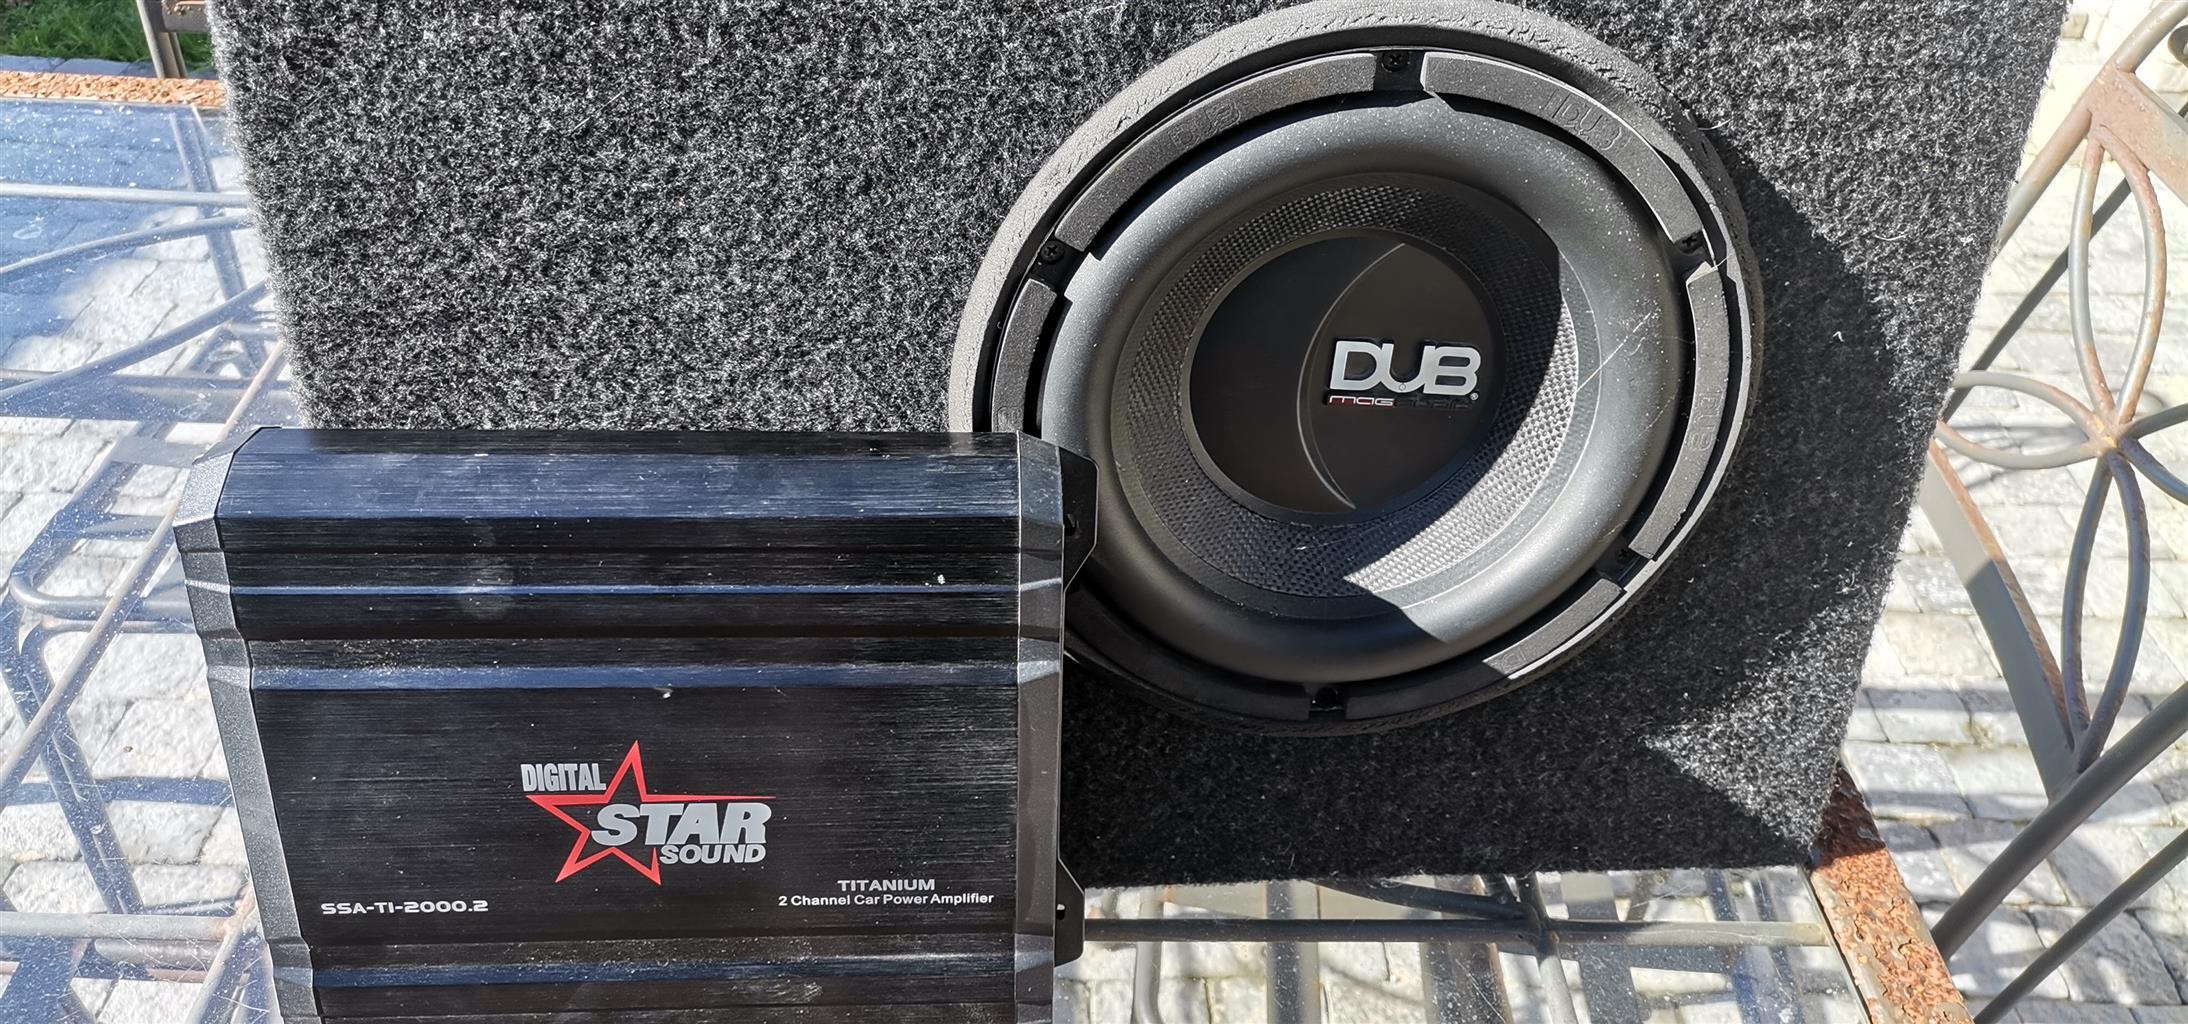 Dub, 10 inch sub and Starsound amp